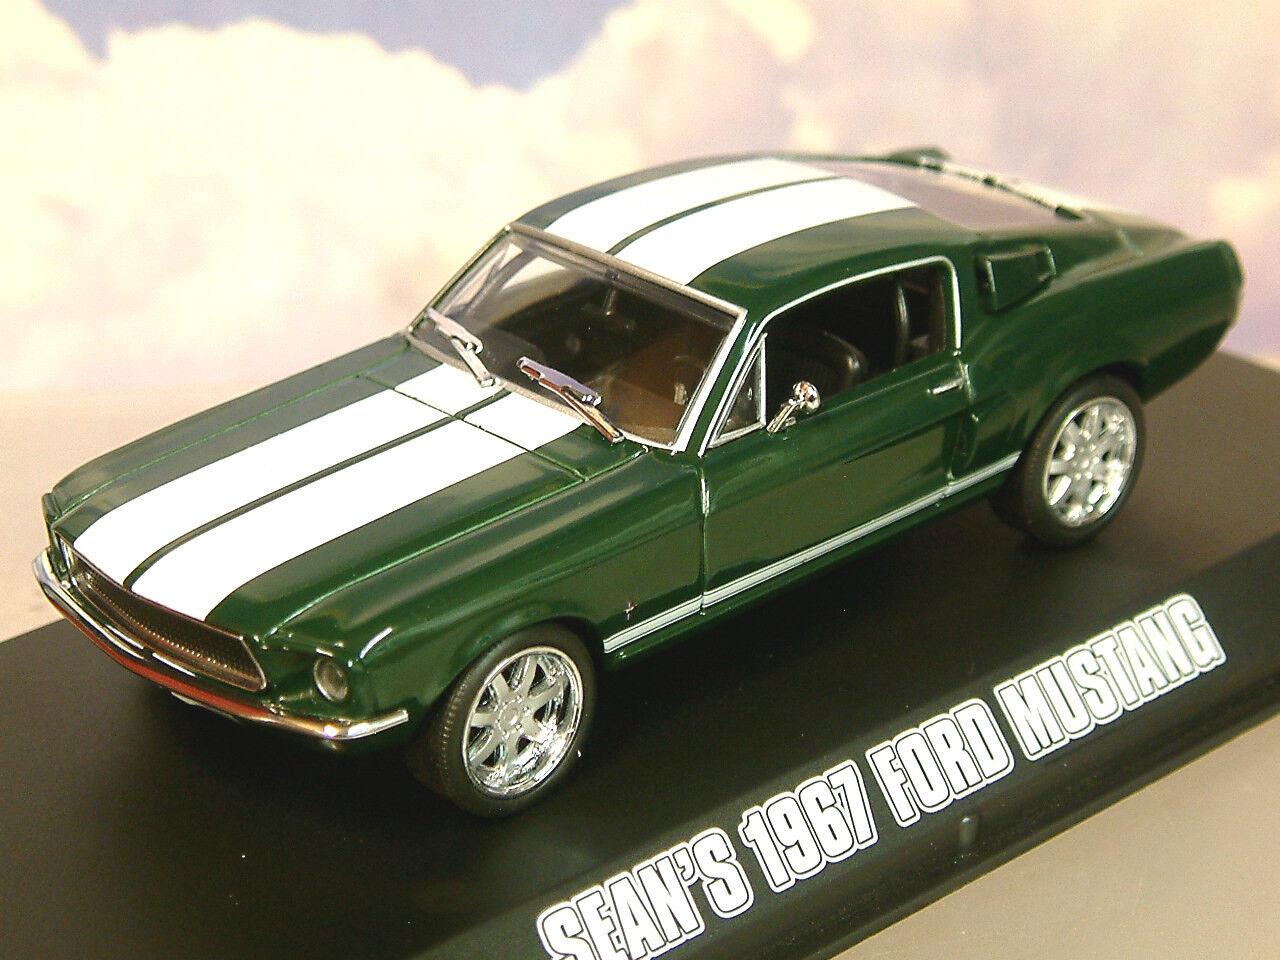 Greenlight diecast 1 43 seans 1967 ford mustang fast furious tokyo drift 86211